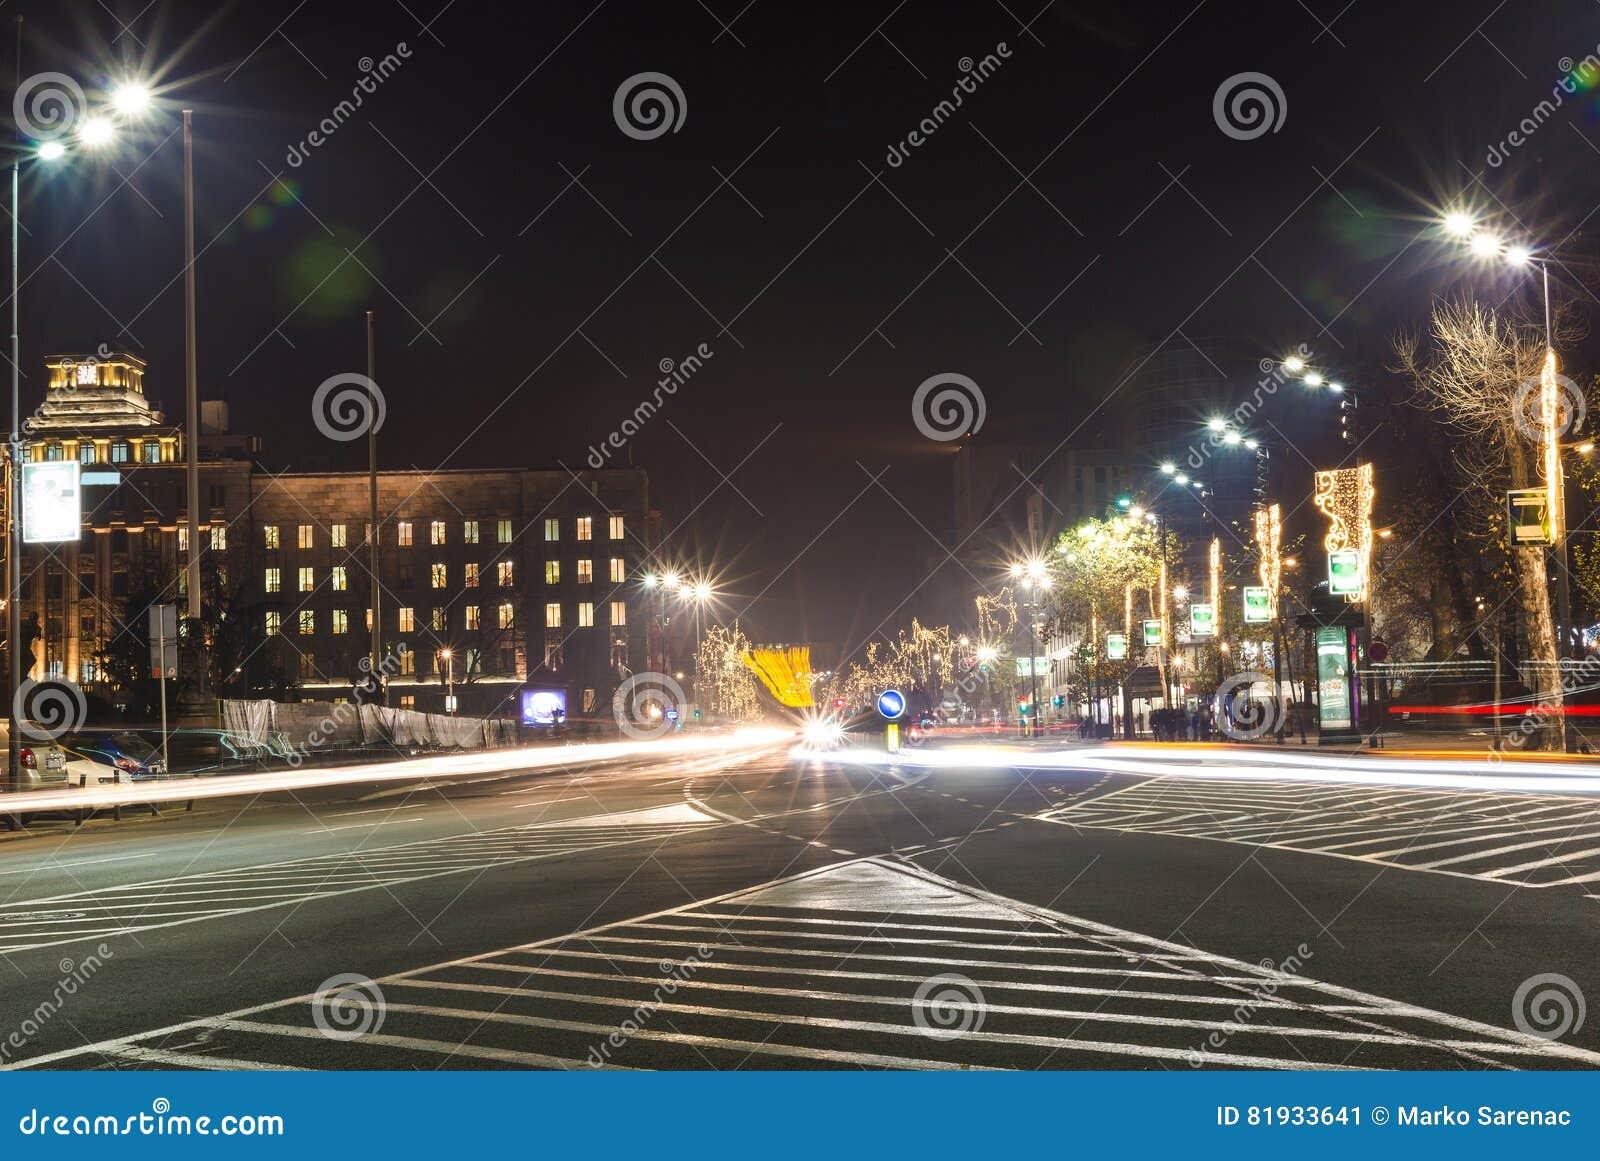 Le trafic occupé aux rues du ` s de Belgrade - Belgrade, Serbie